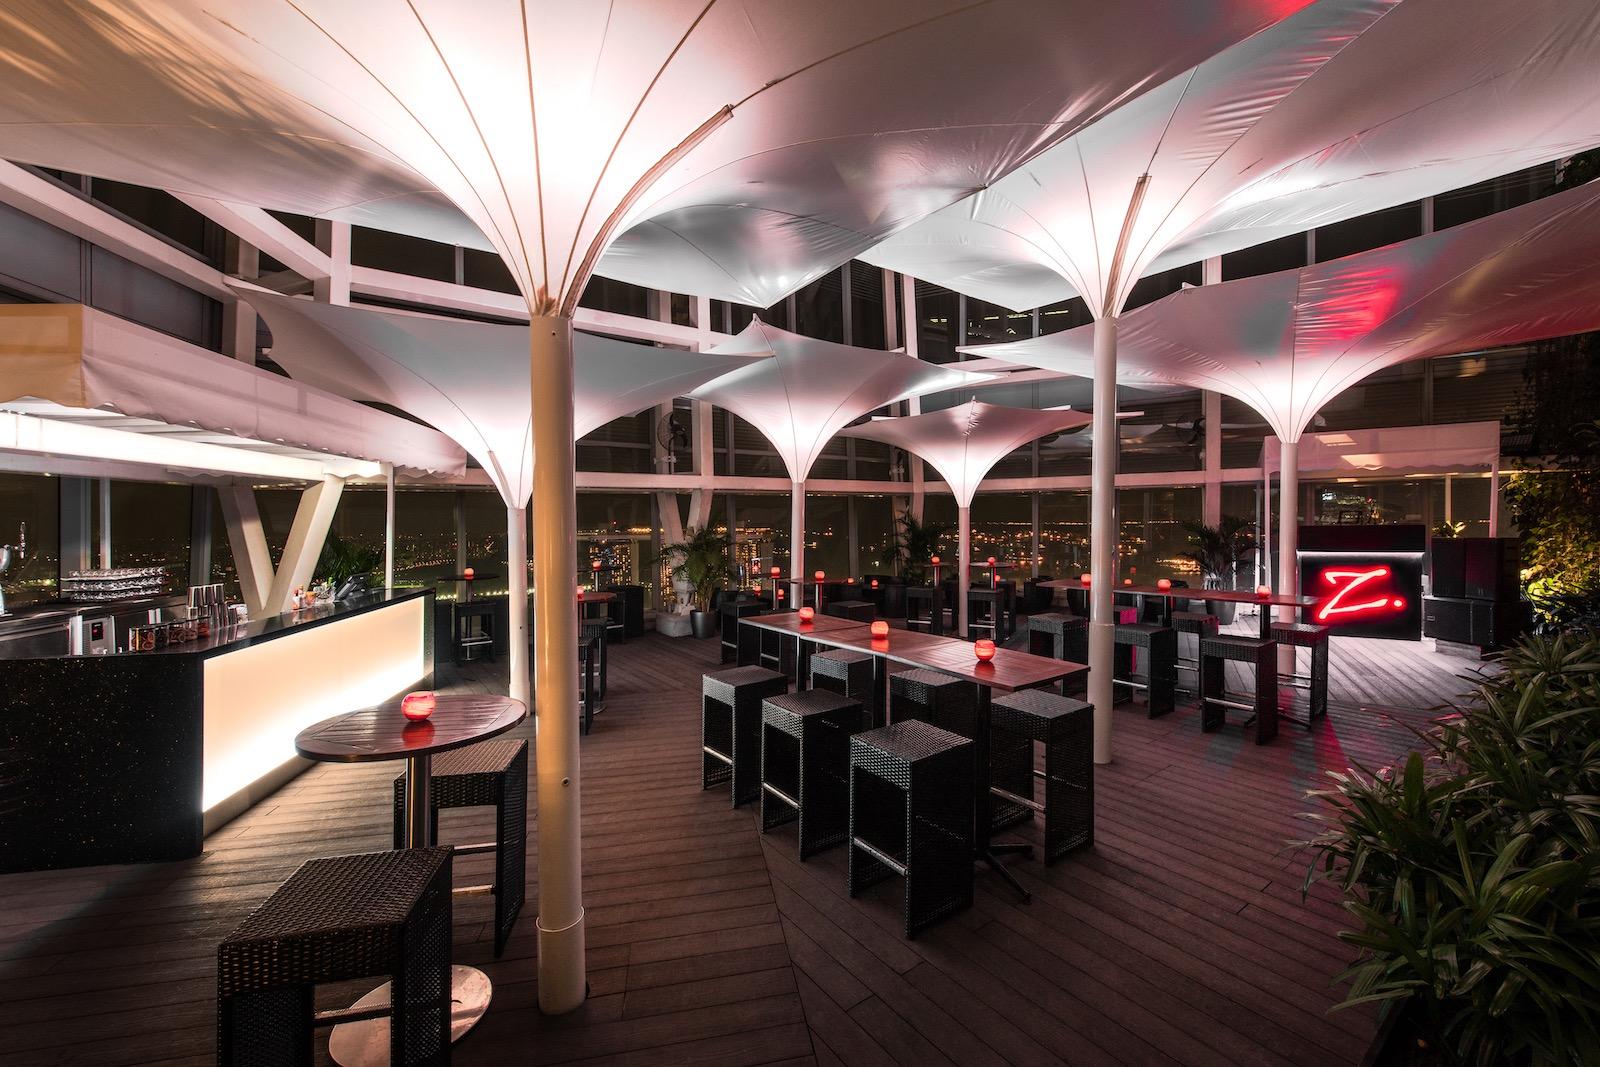 Zafferano Terrace – rooftop lounge in Singapore | Asia Bars & Restaurants